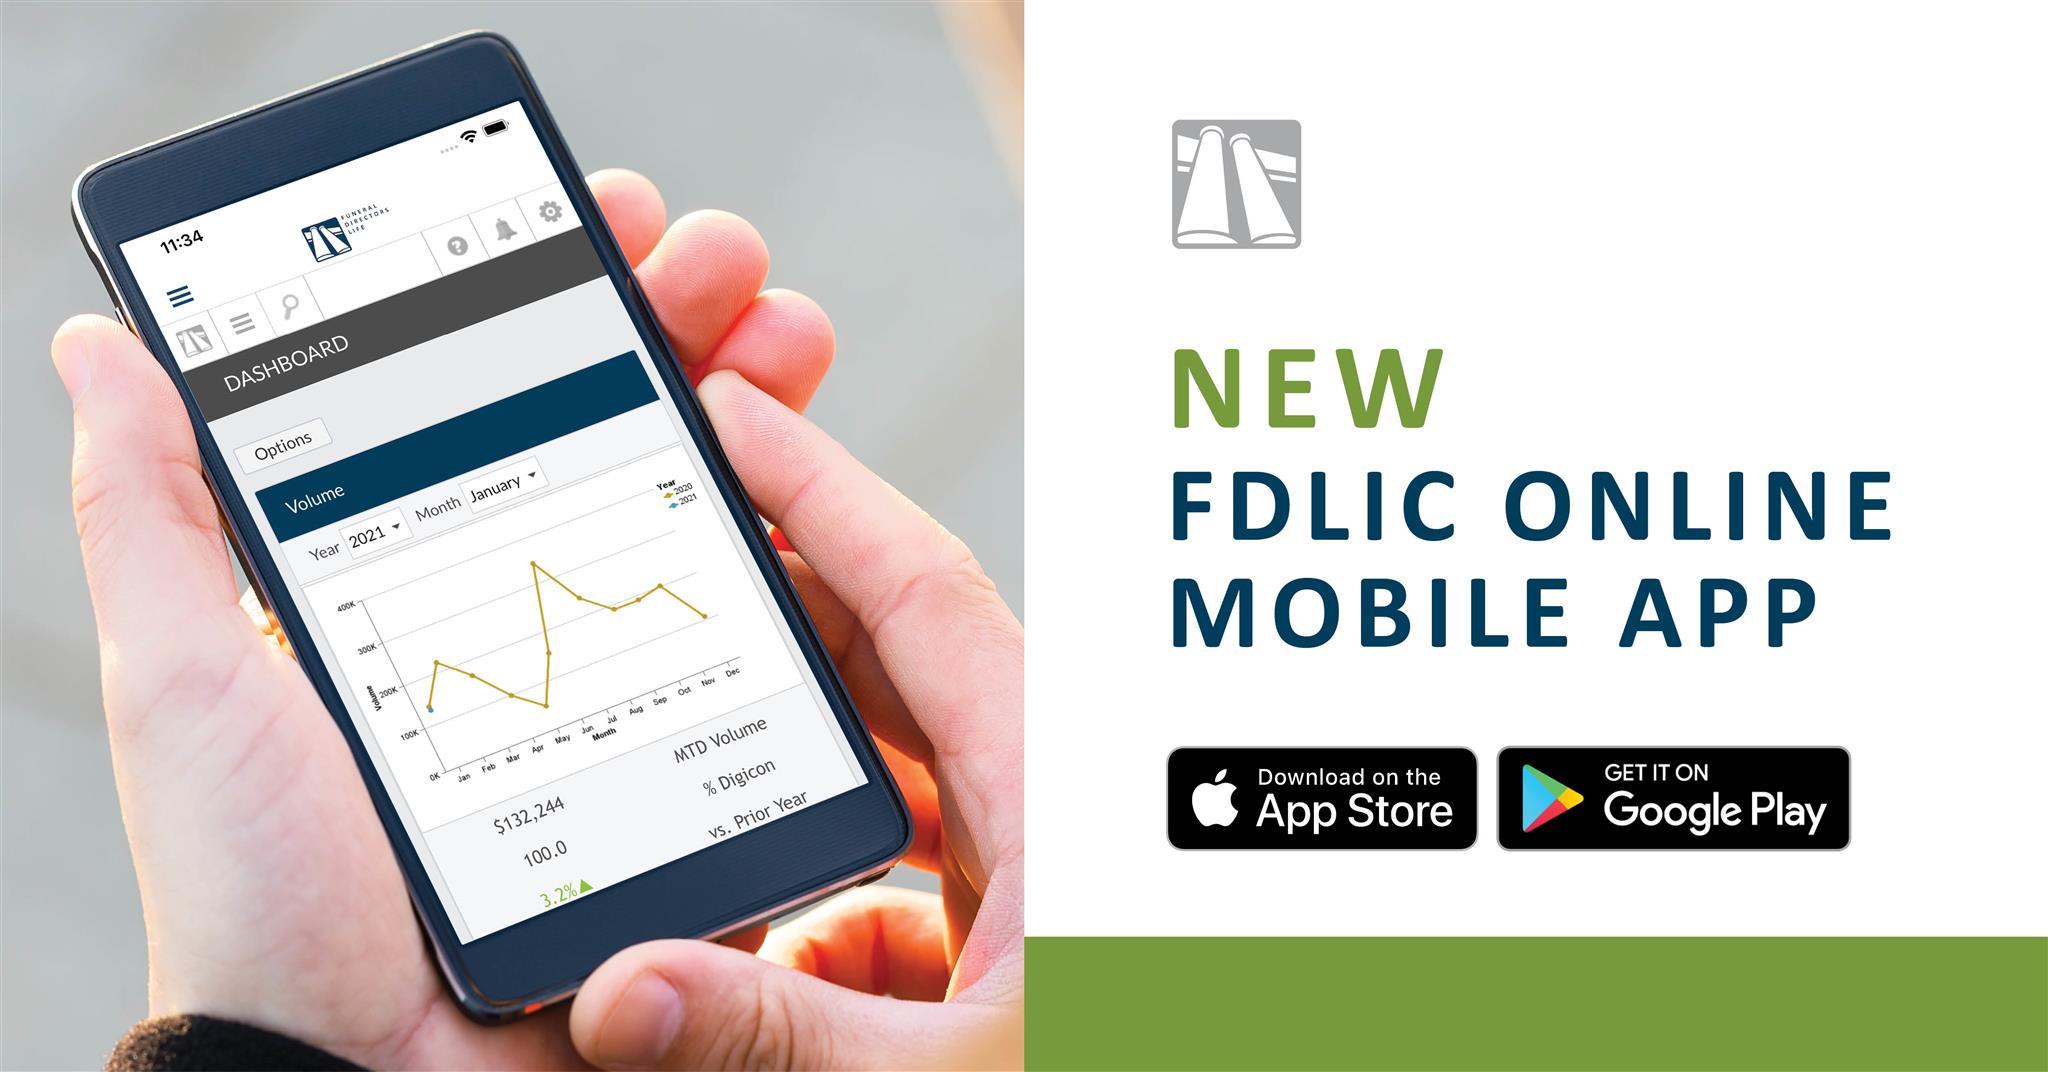 new fdlic online mobile app